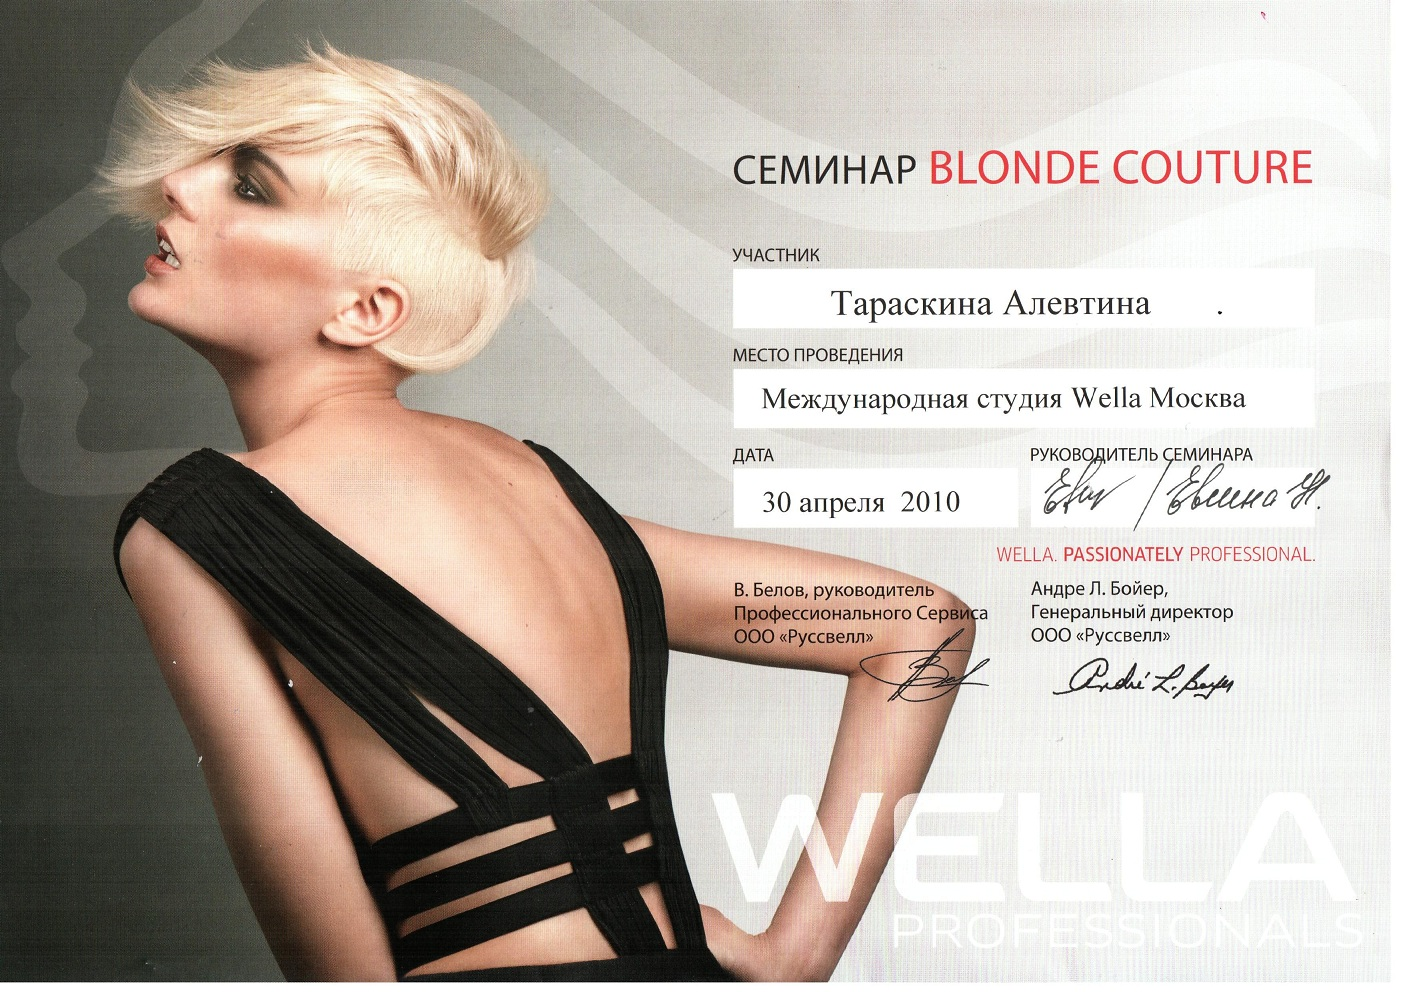 2010 blonde couture wella